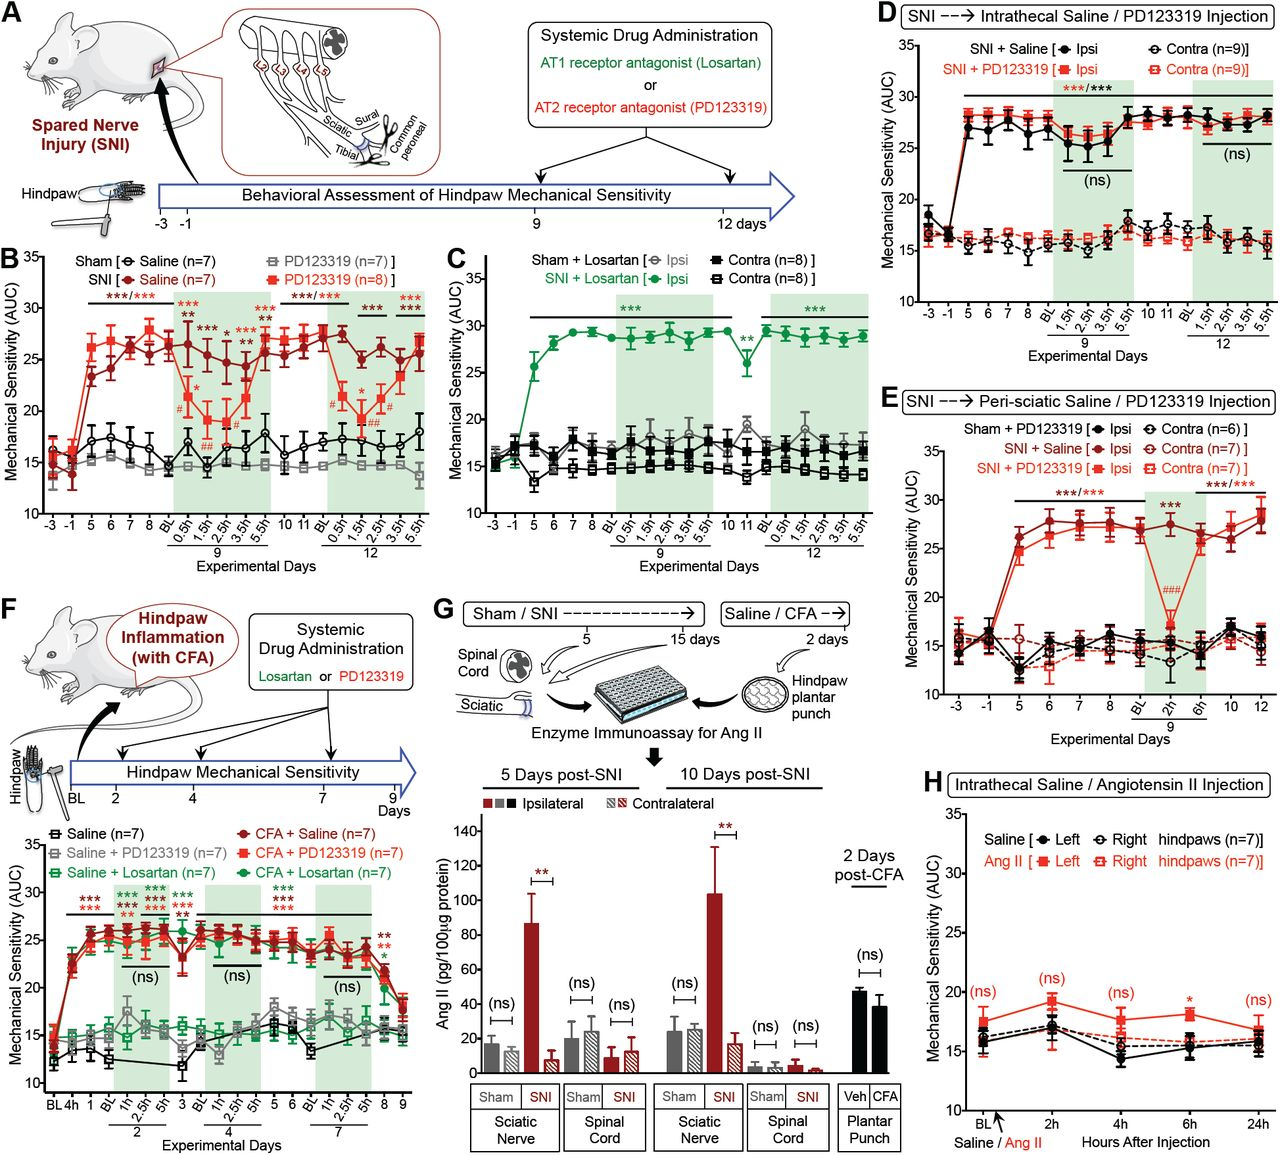 Macrophage-to-sensory neuron crosstalk mediated by Angiotensin II